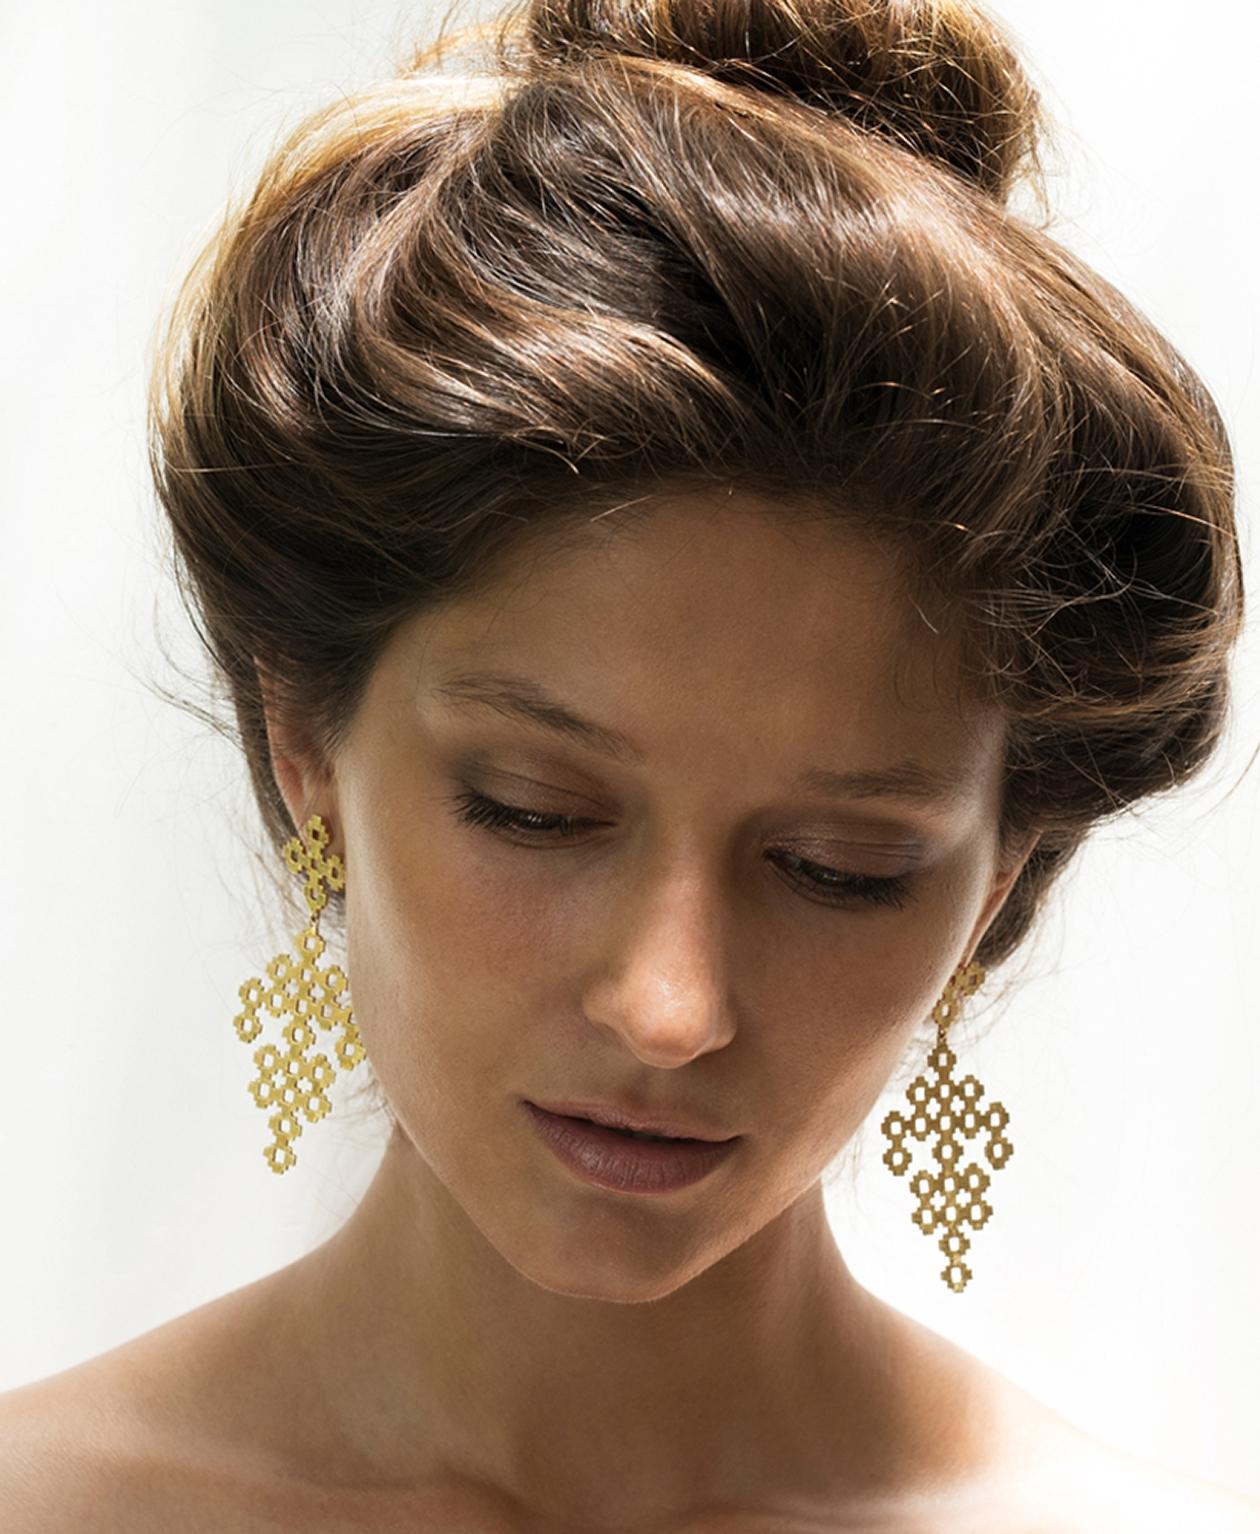 Chimi Earrings - Image